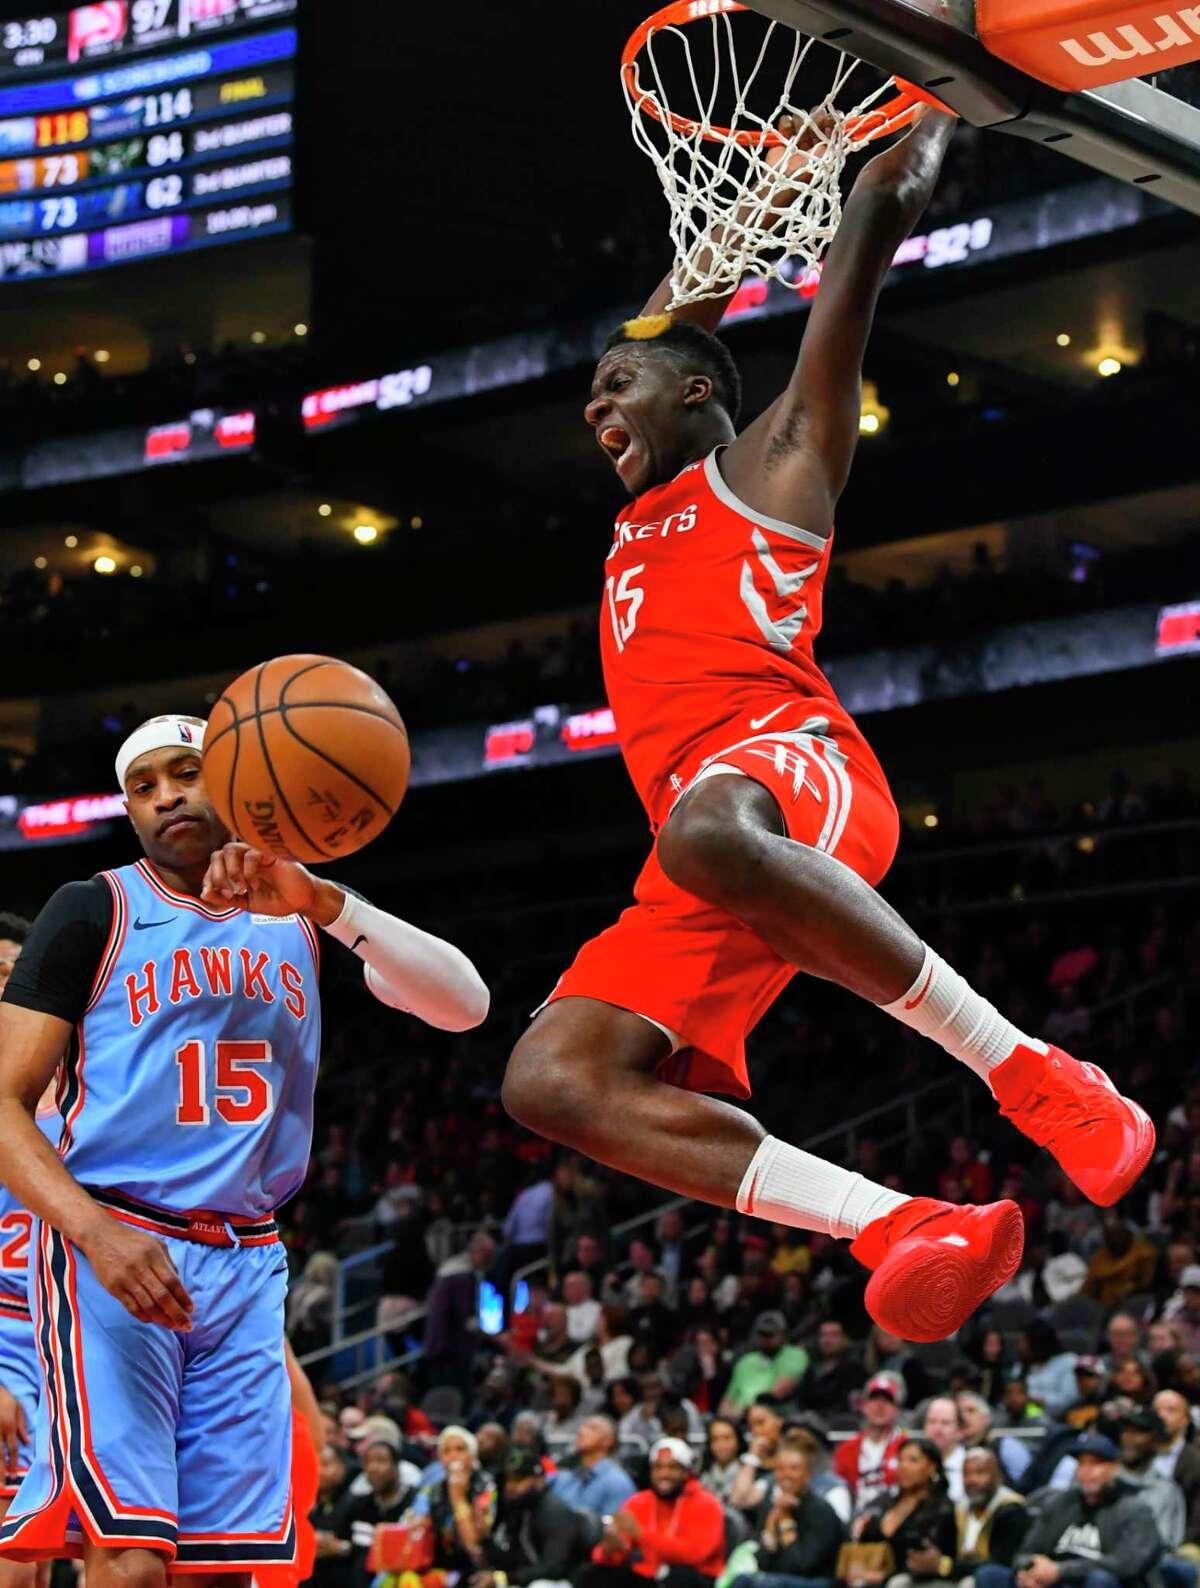 Houston Rockets center Clint Capela dunks on Atlanta Hawks forward Vince Carter, left, during the second half of an NBA basketball game Tuesday, March 19, 2019, in Atlanta. Houston won 121-105. (AP Photo/John Amis)